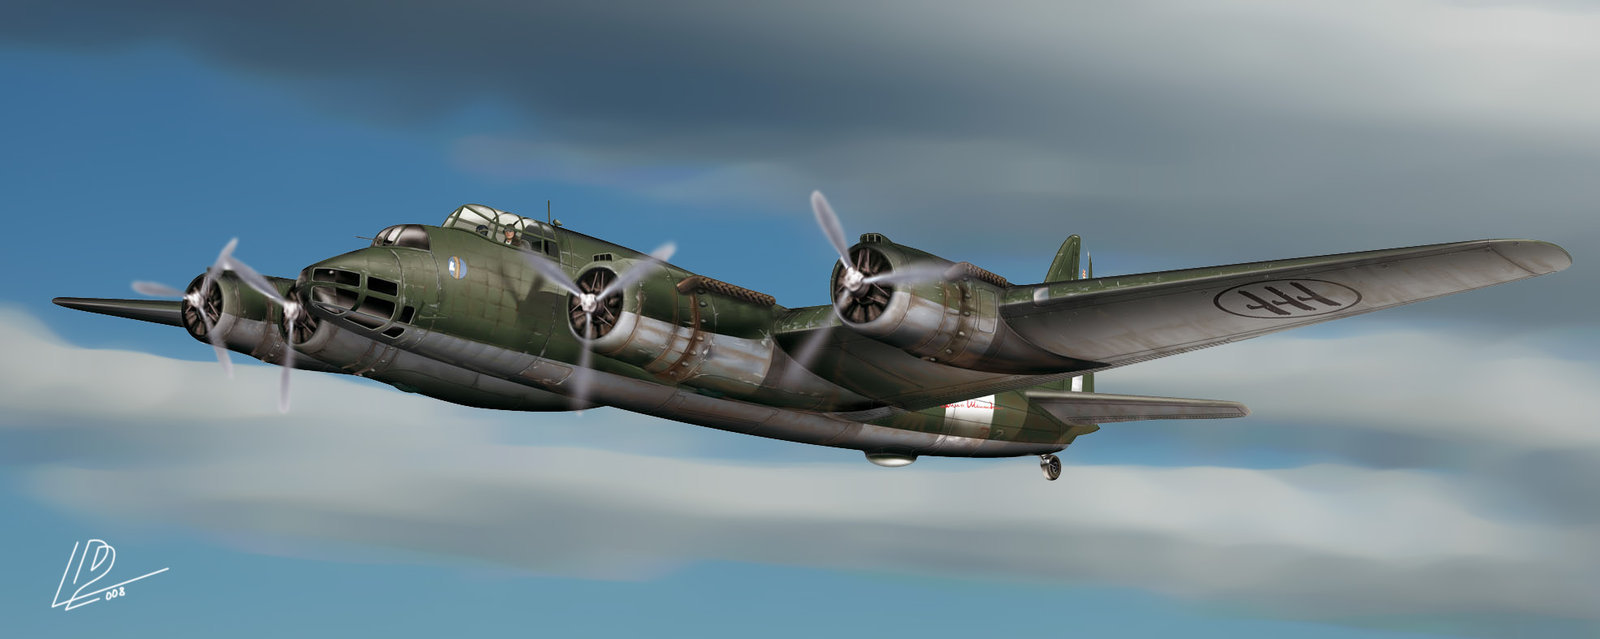 Gomez Luis David. Бомбардировщик Piaggio Aircraft.